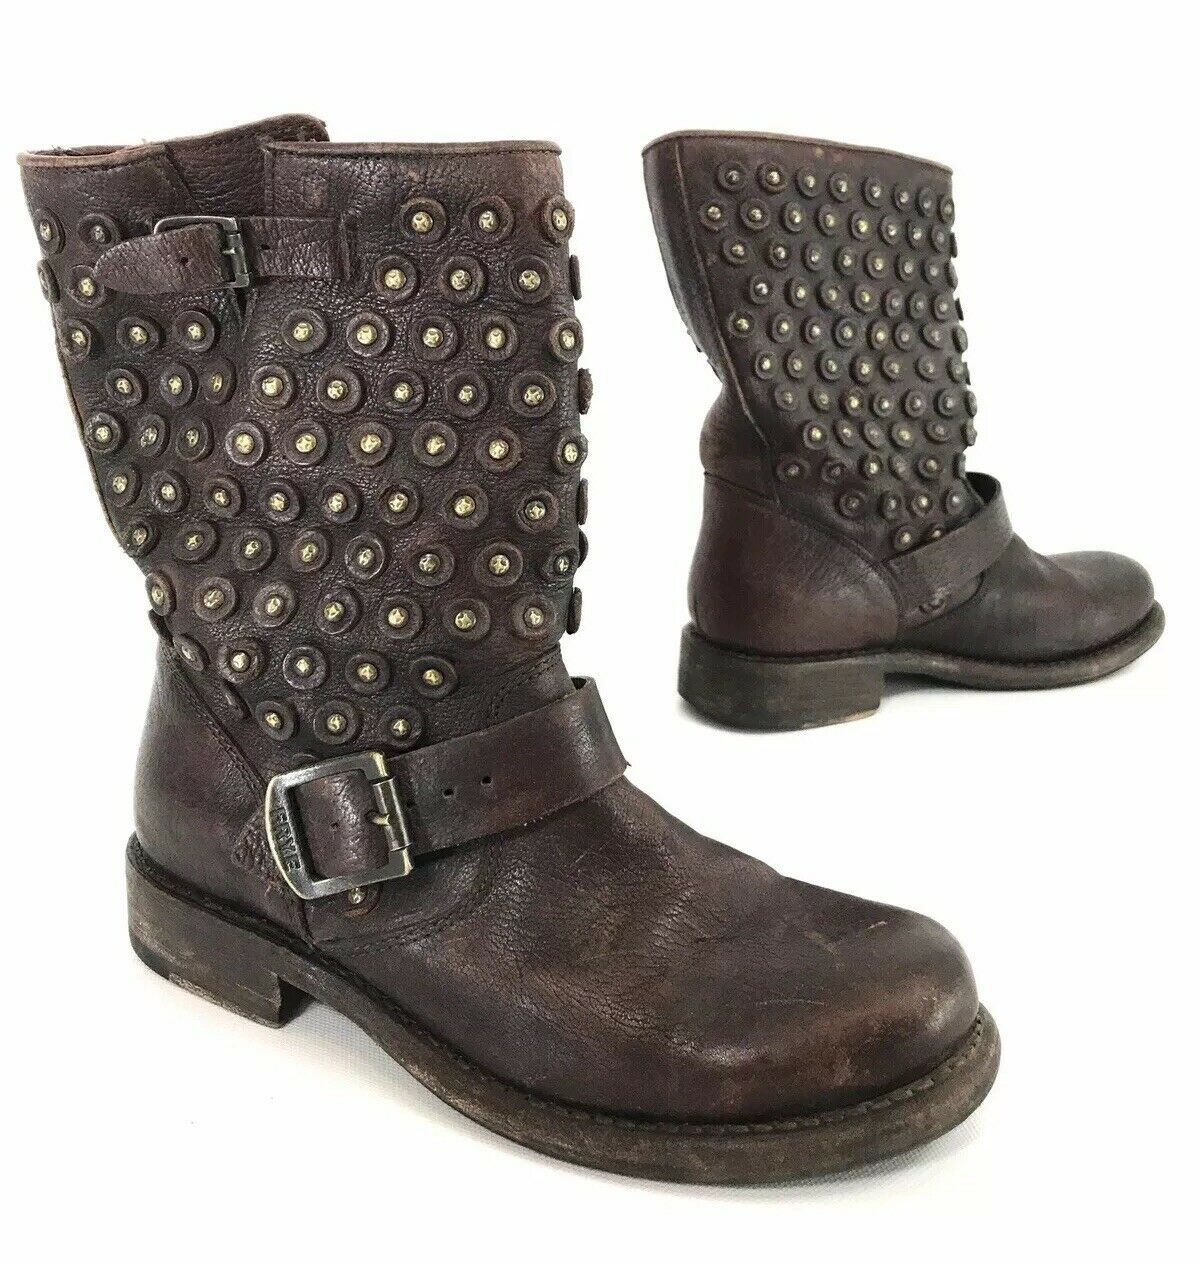 Frye Womens Jenna Short Disc Biker Boots Dark Brown Distressed Leather Size 6